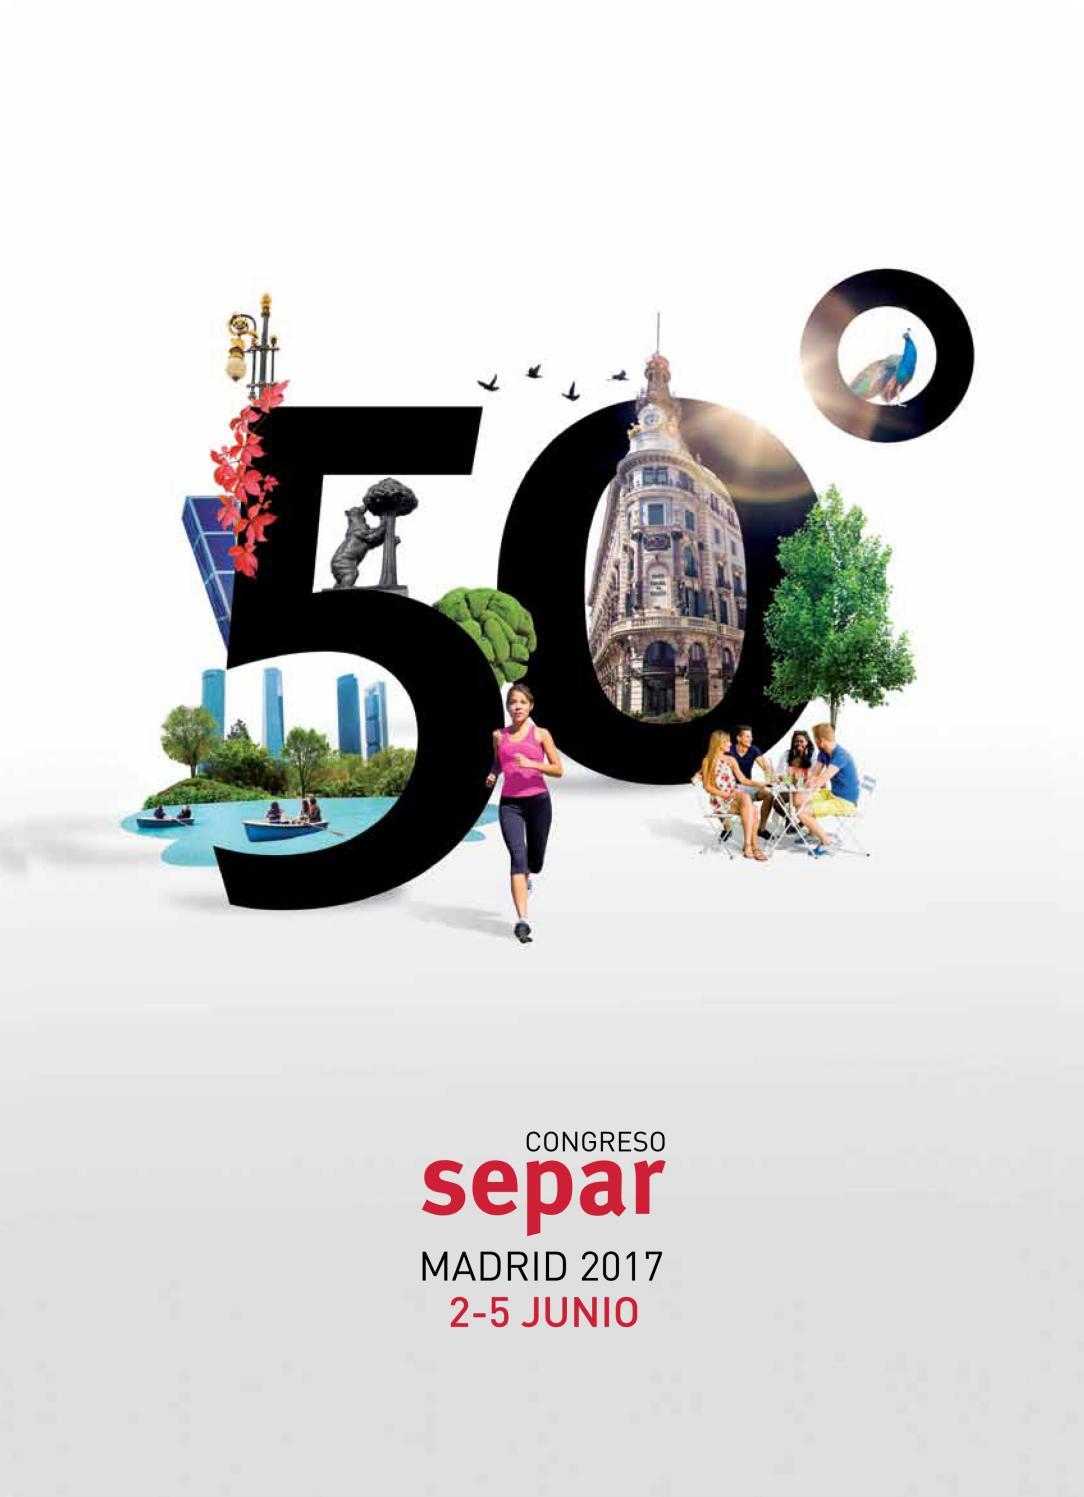 Programa Congreso SEPAR Madrid 2017 by SEPAR - issuu